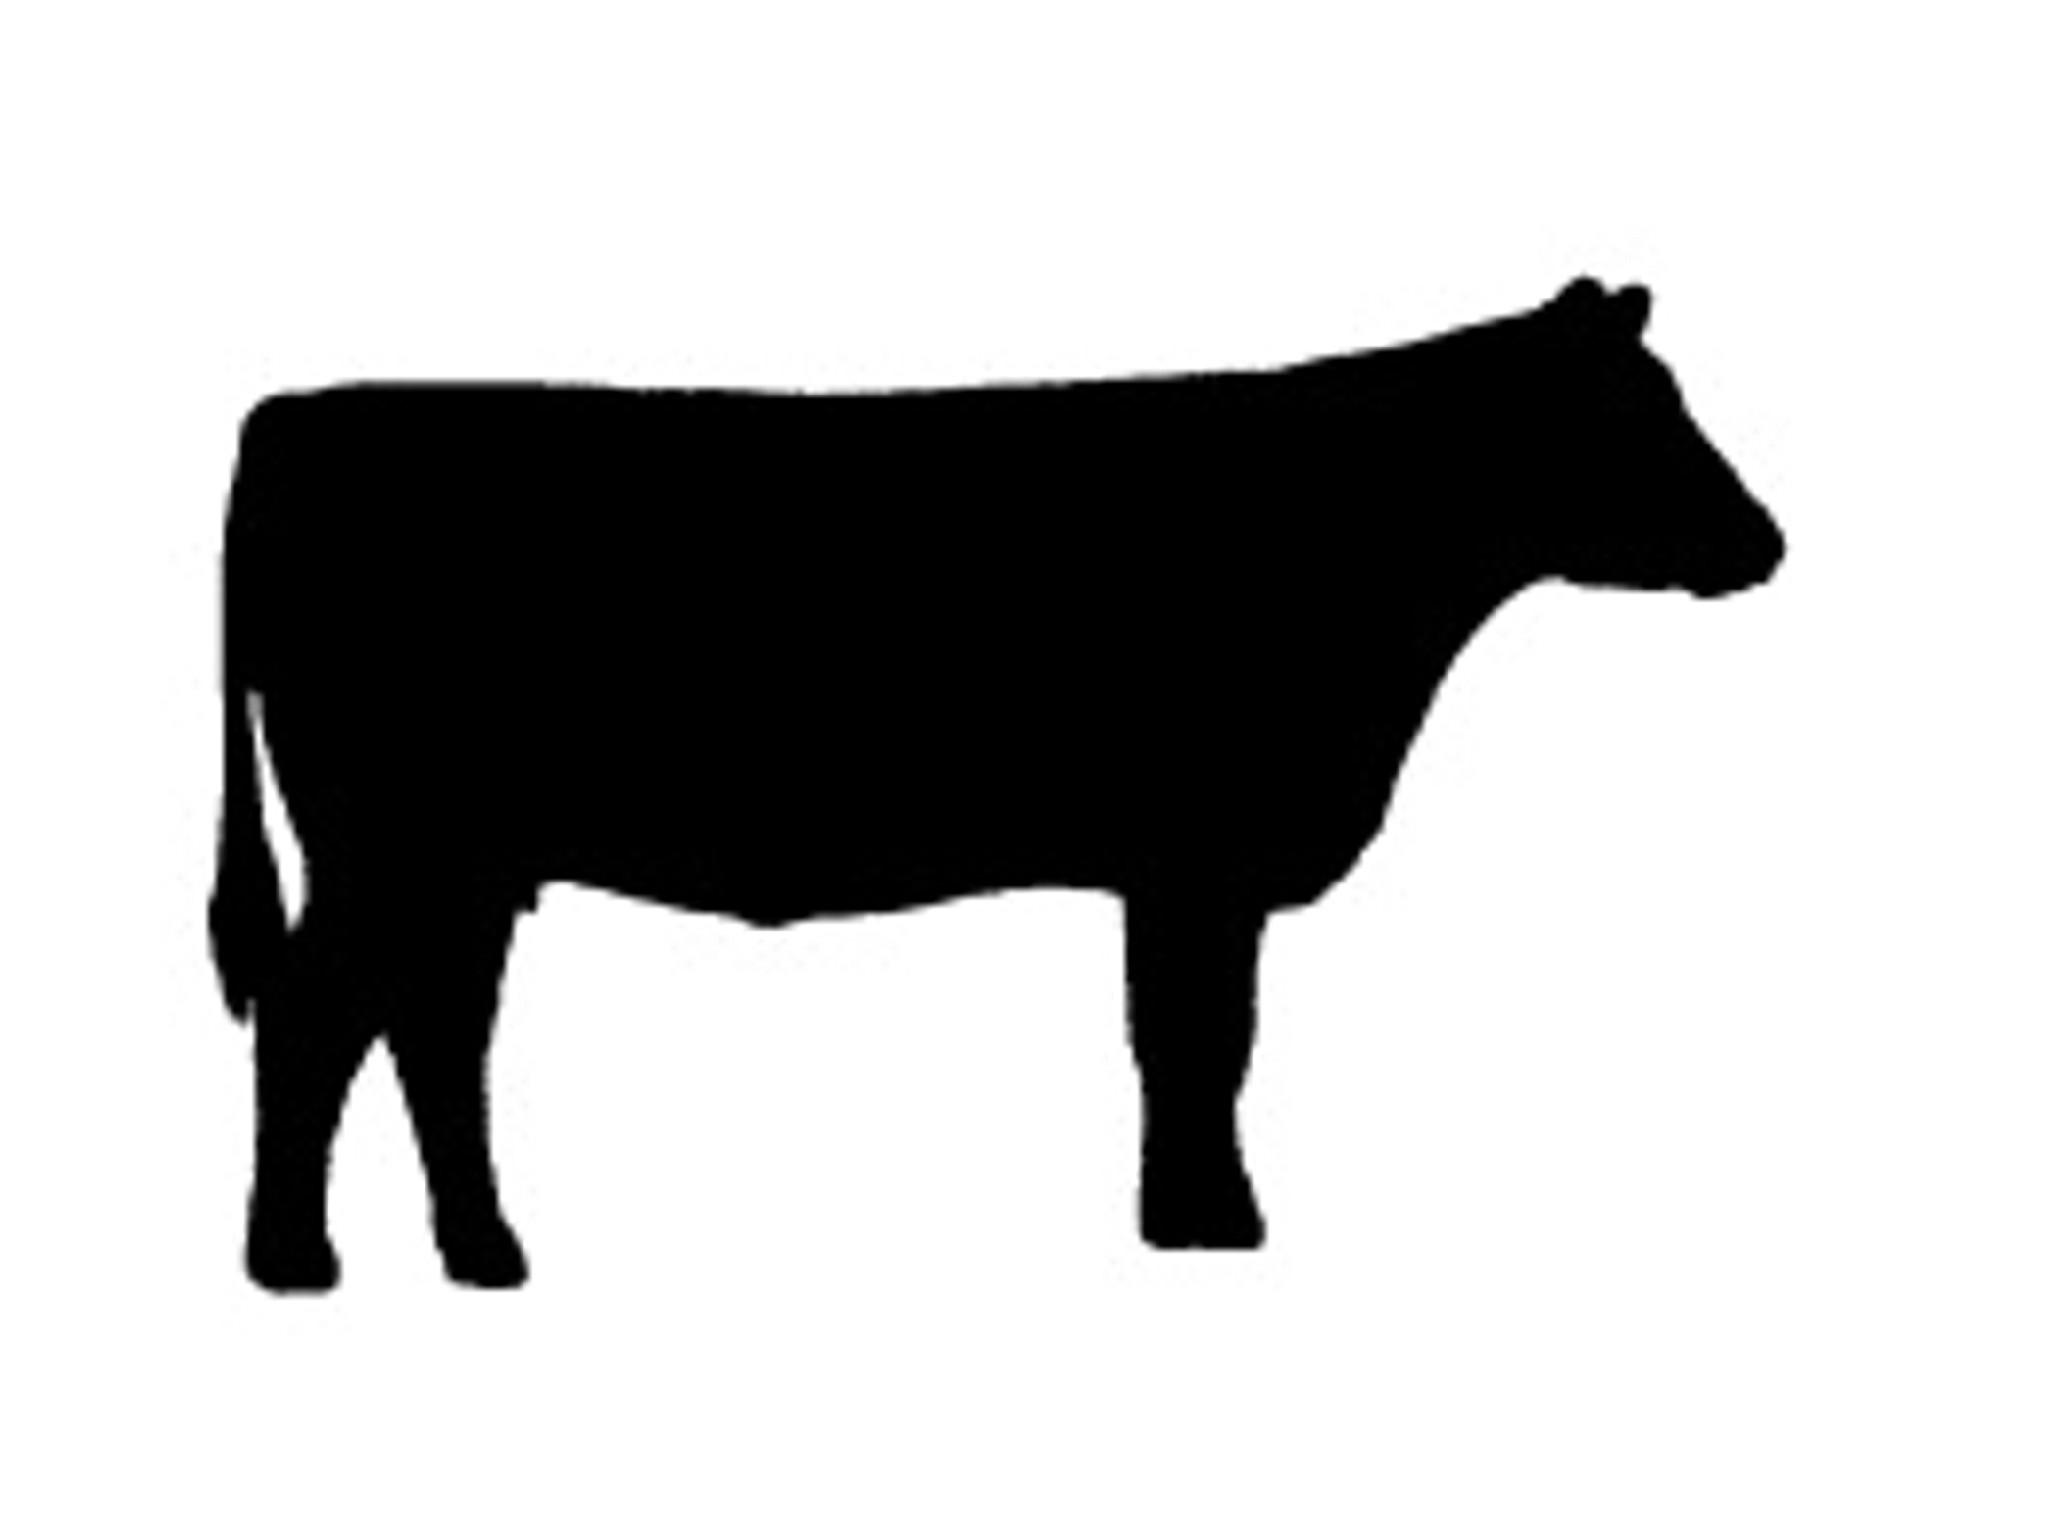 2048x1536 Dairy Cow Head Silhouette